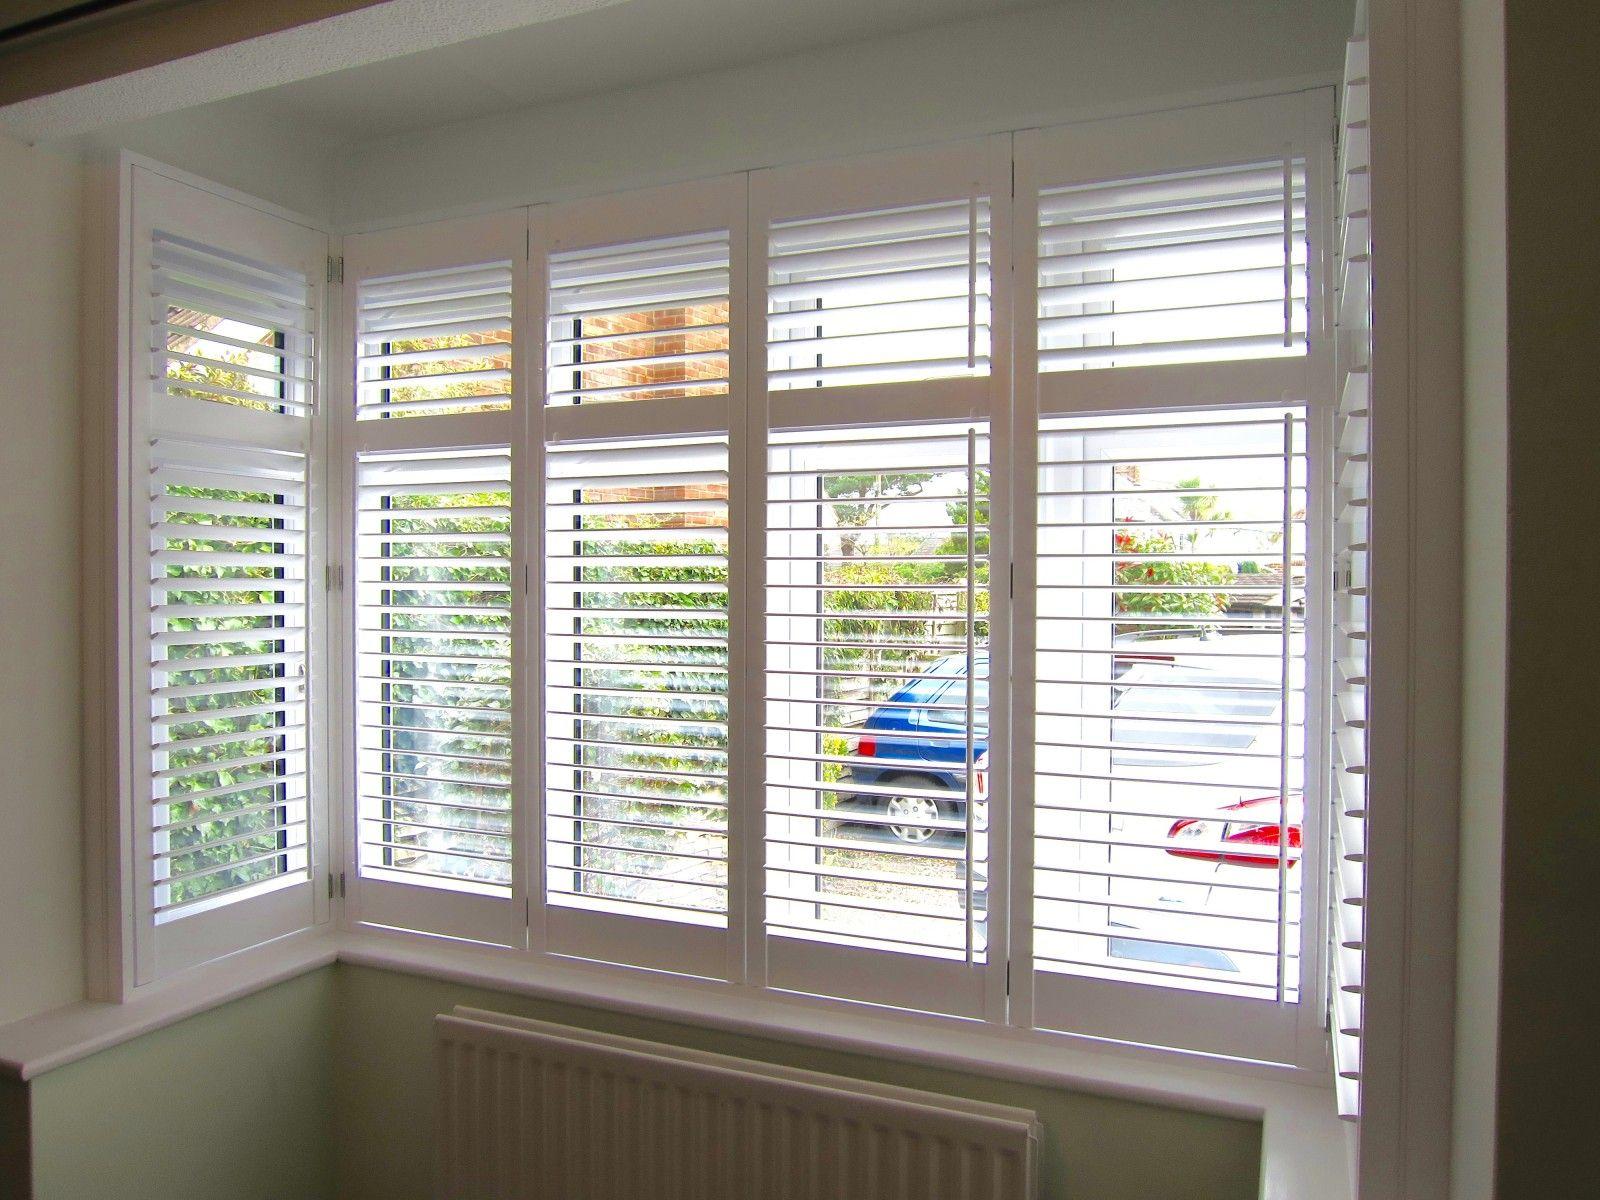 Image result for casement window shutters Window